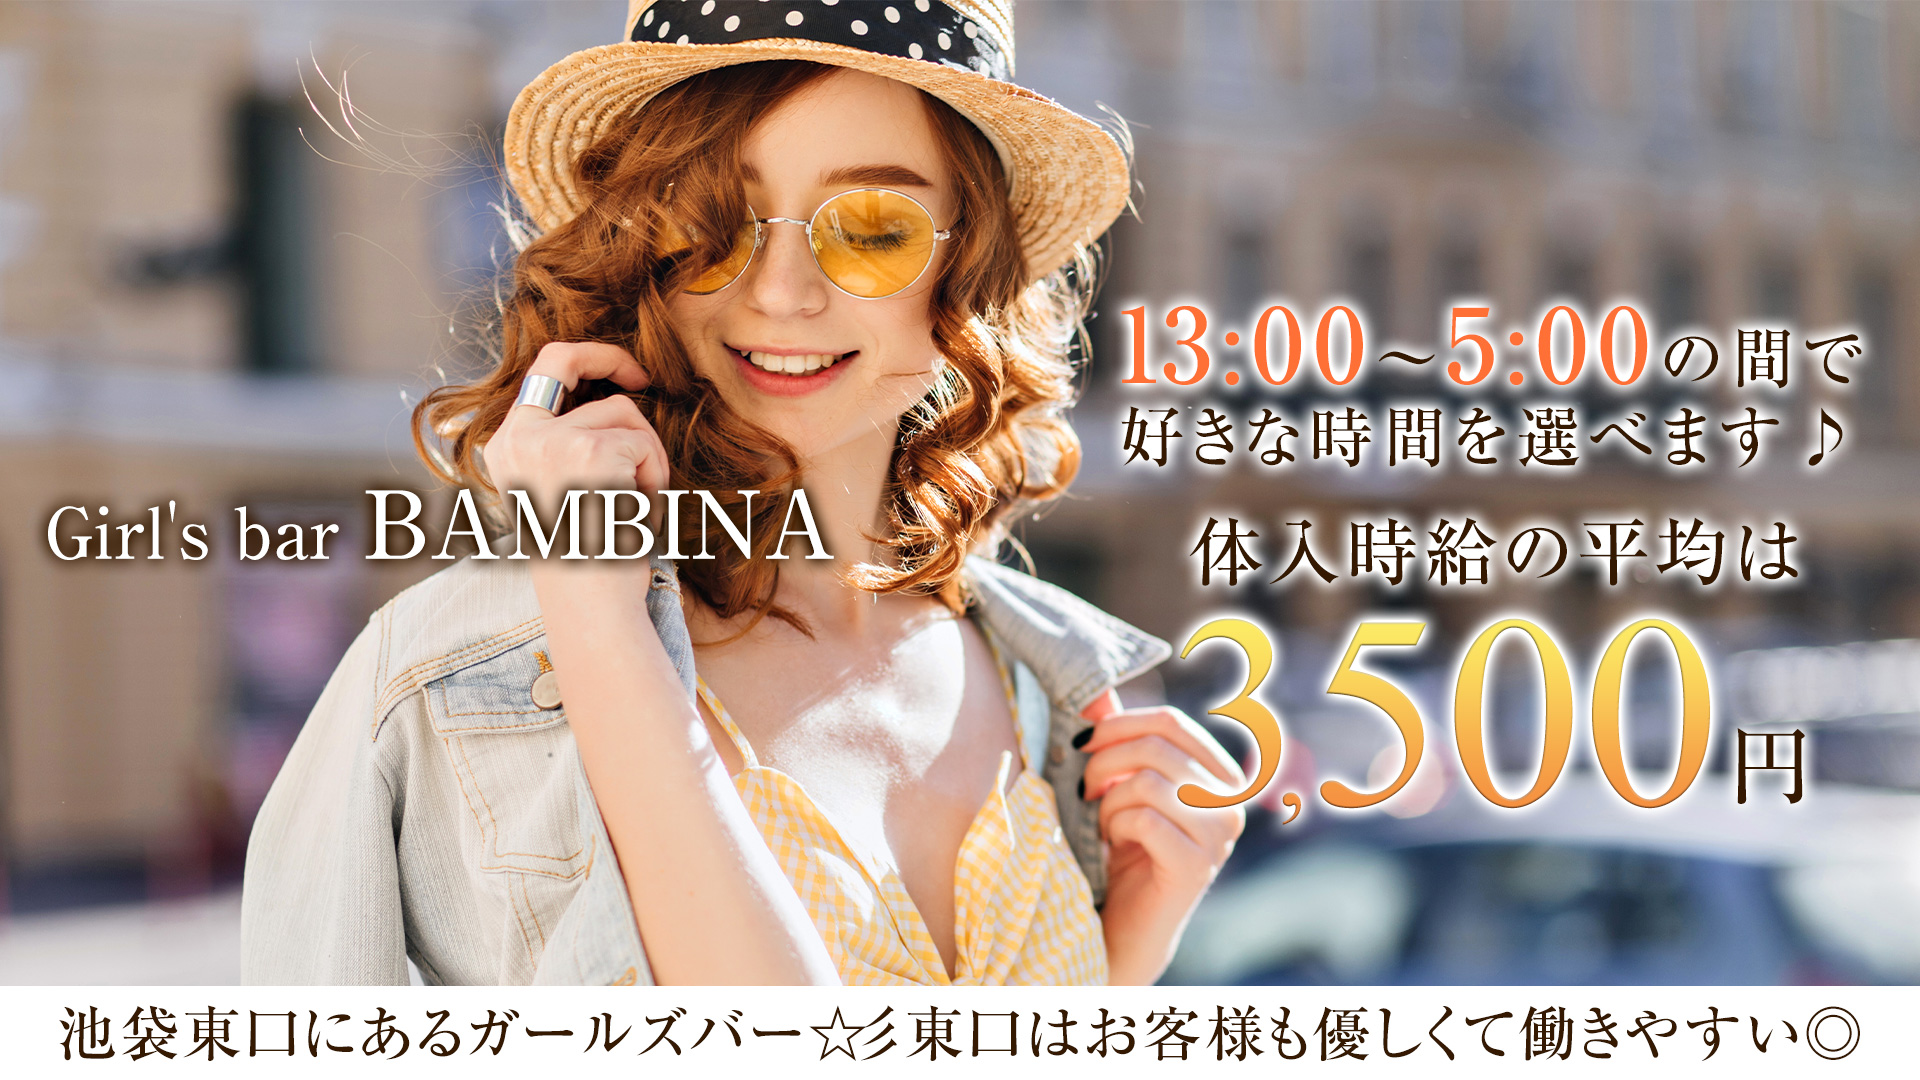 girl's bar BAMBINA<バンビーナ> 池袋 ガールズバー TOP画像